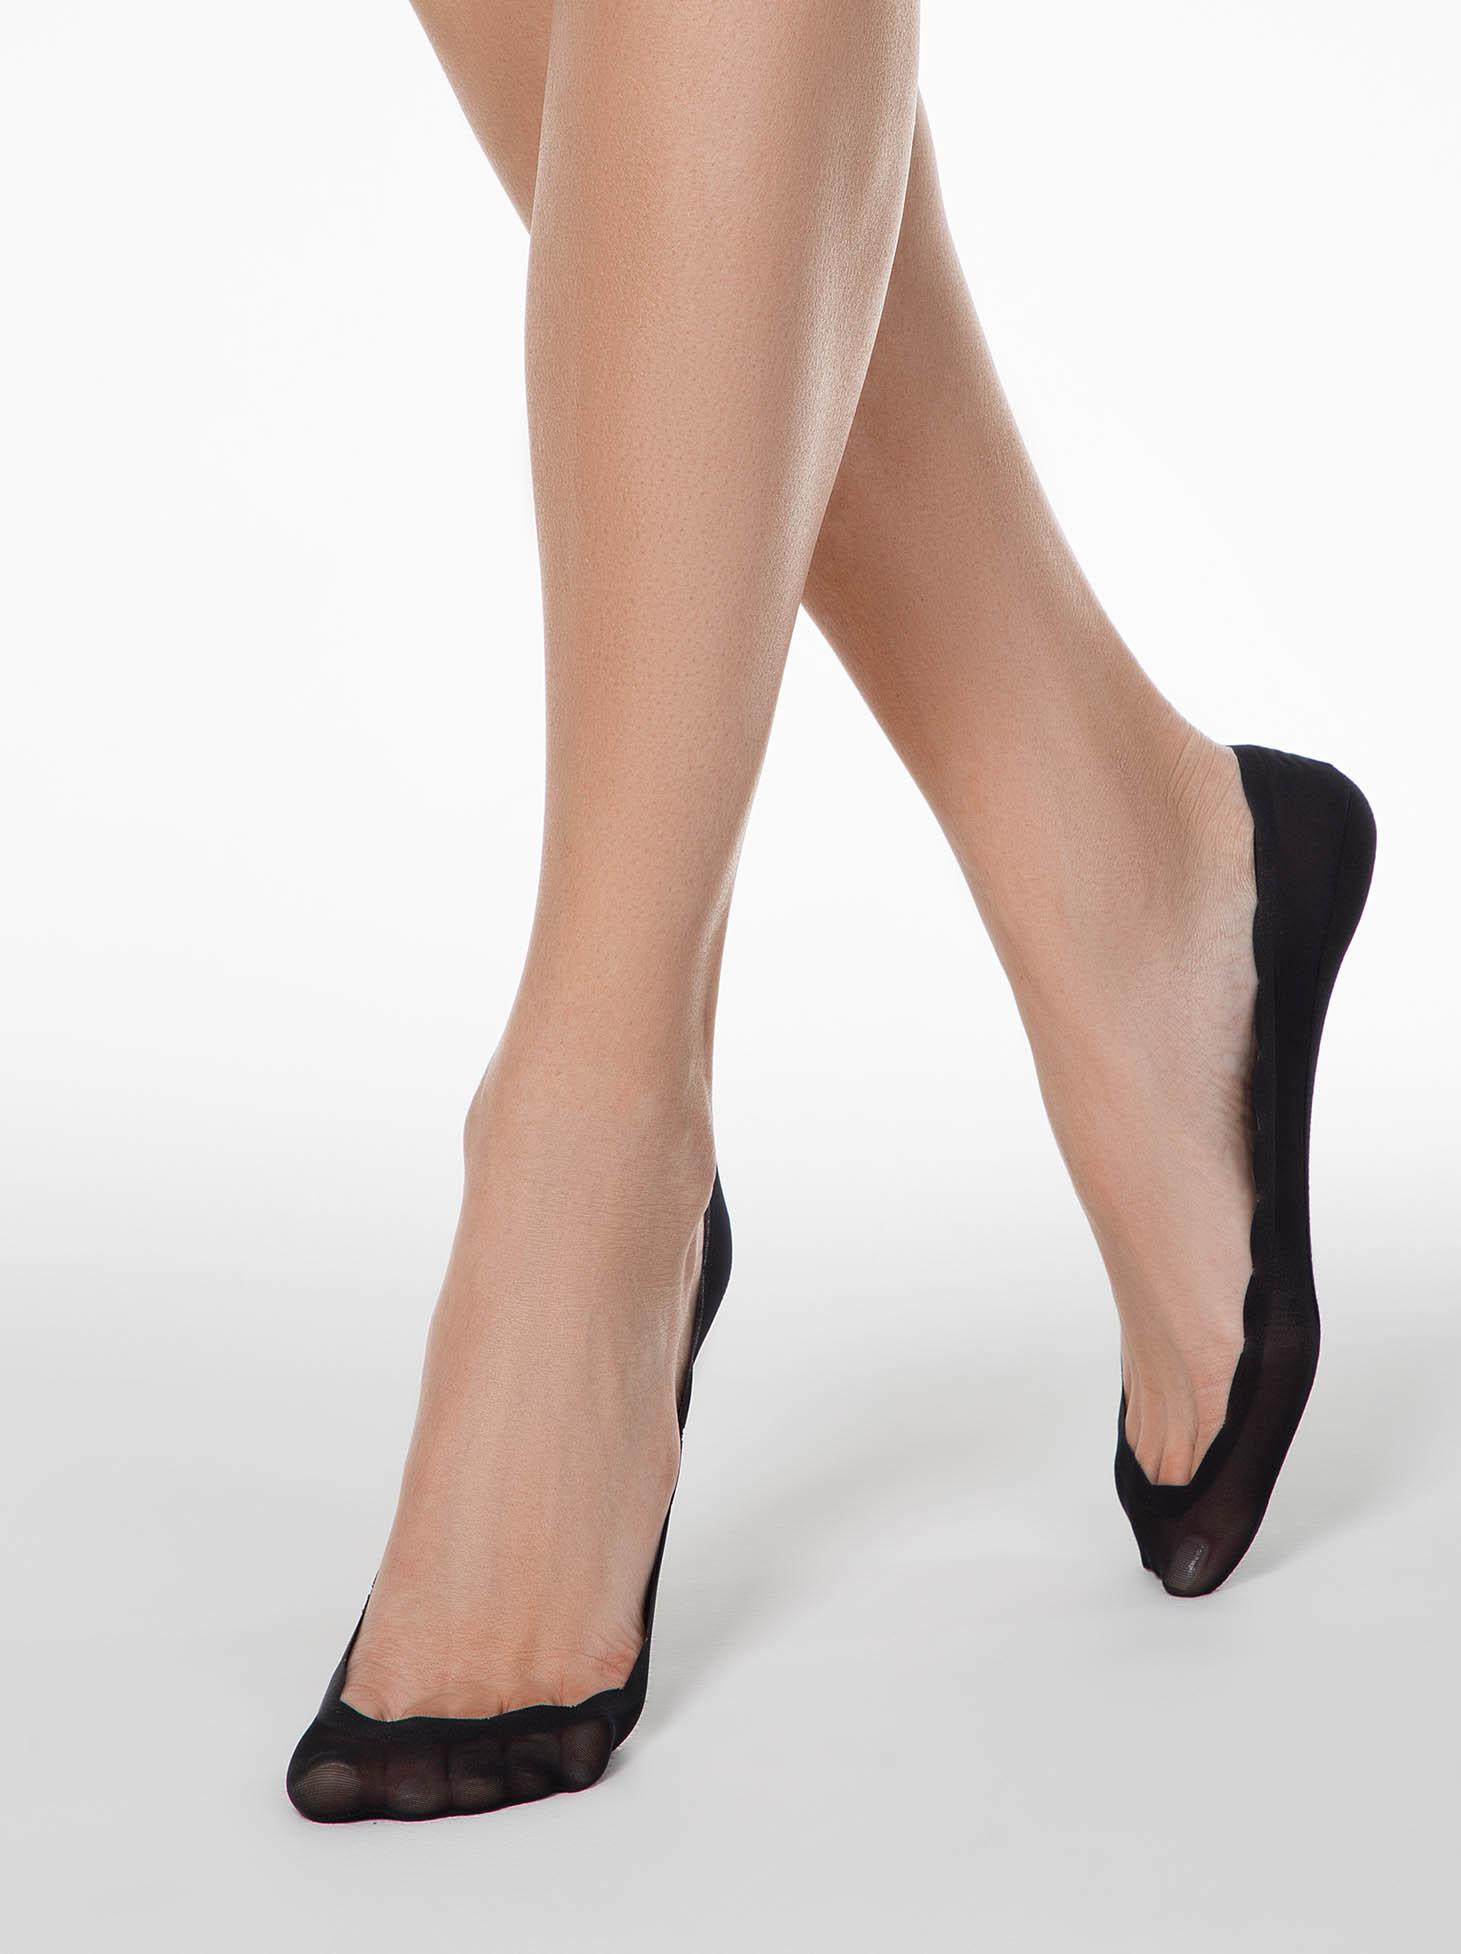 Black tights & socks elastic cotton